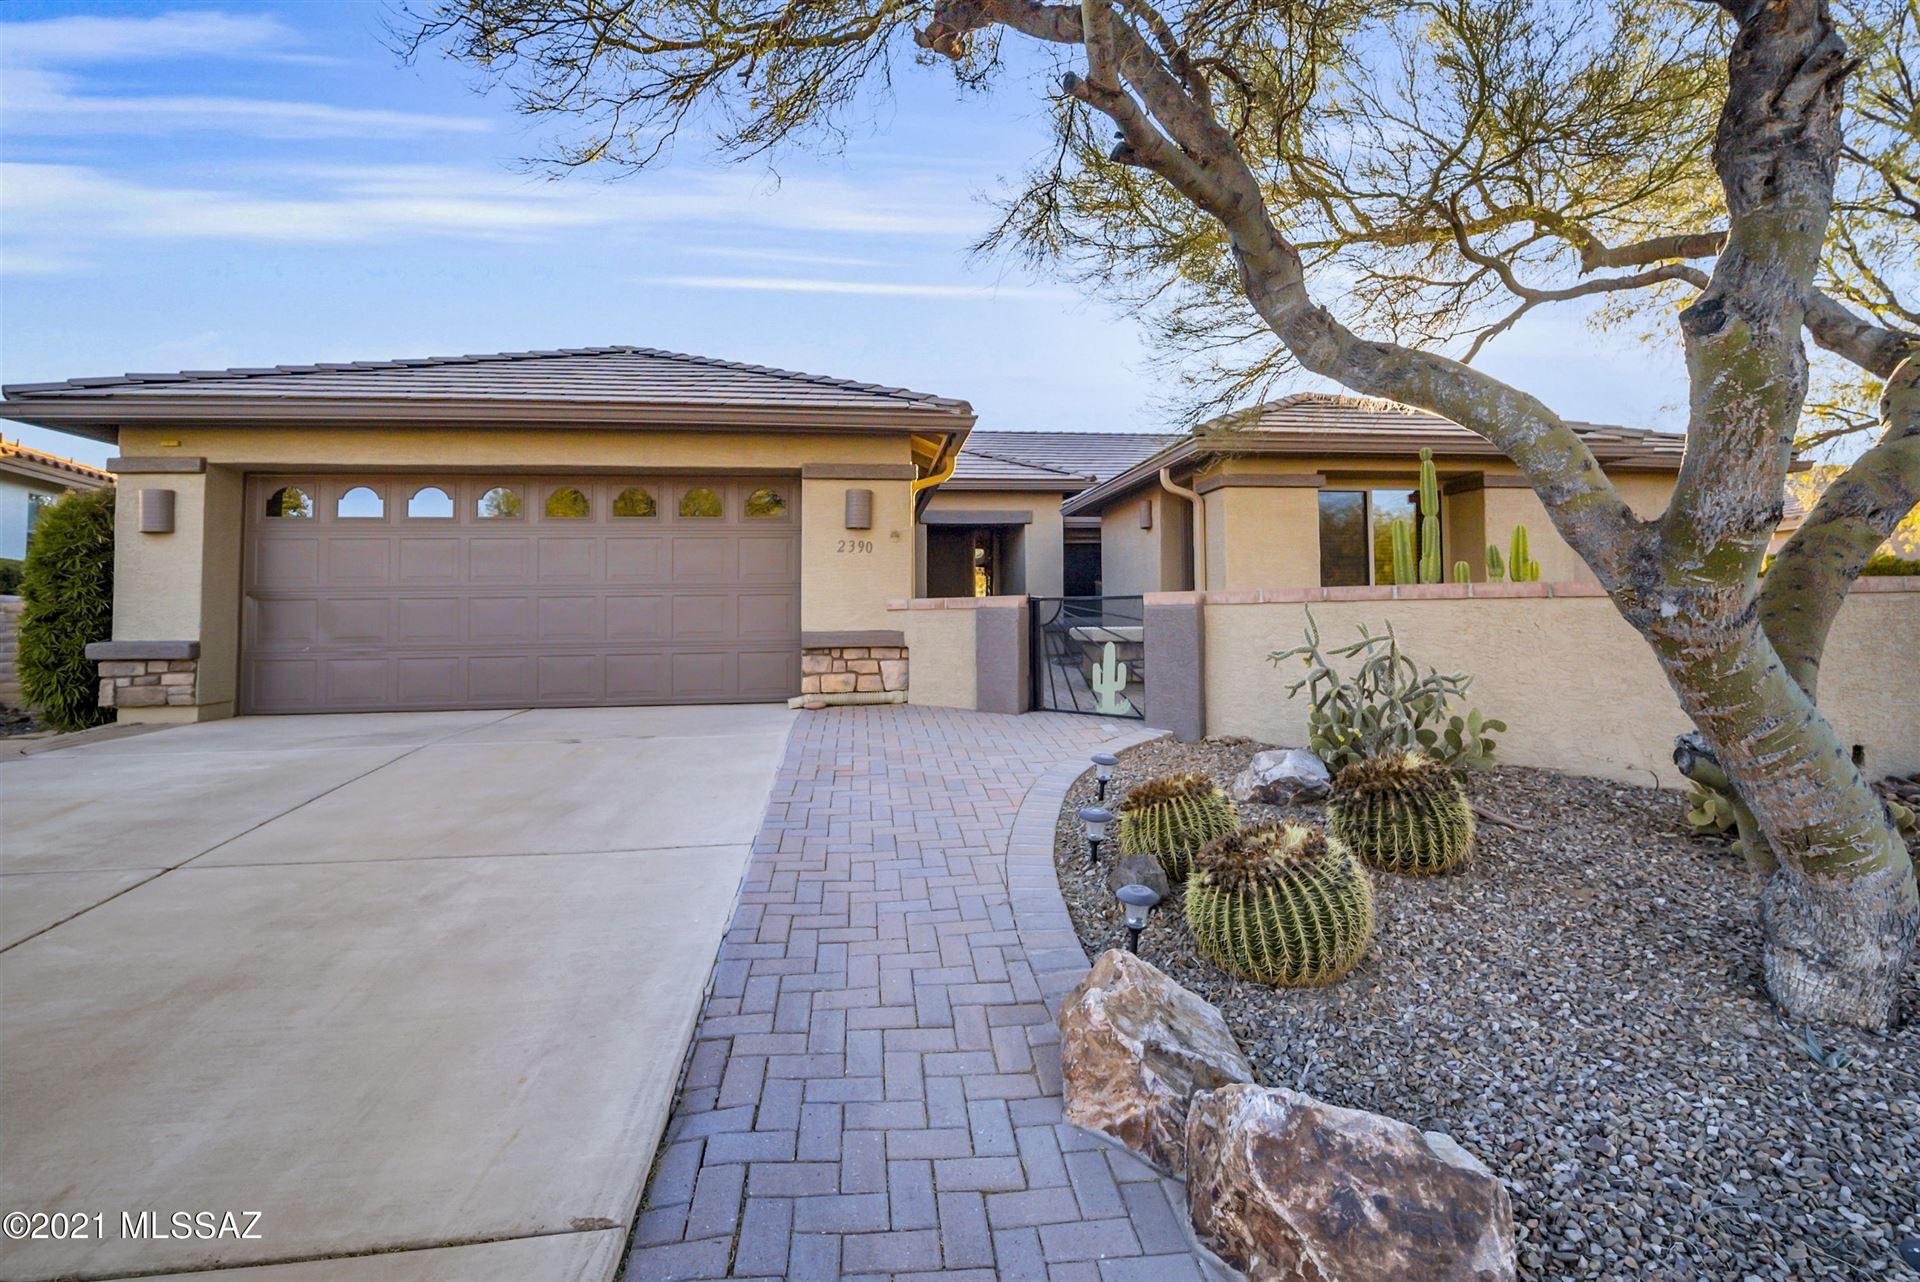 2390 E Bluejay Bluff Lane, Green Valley, AZ 85614 - MLS#: 22101133